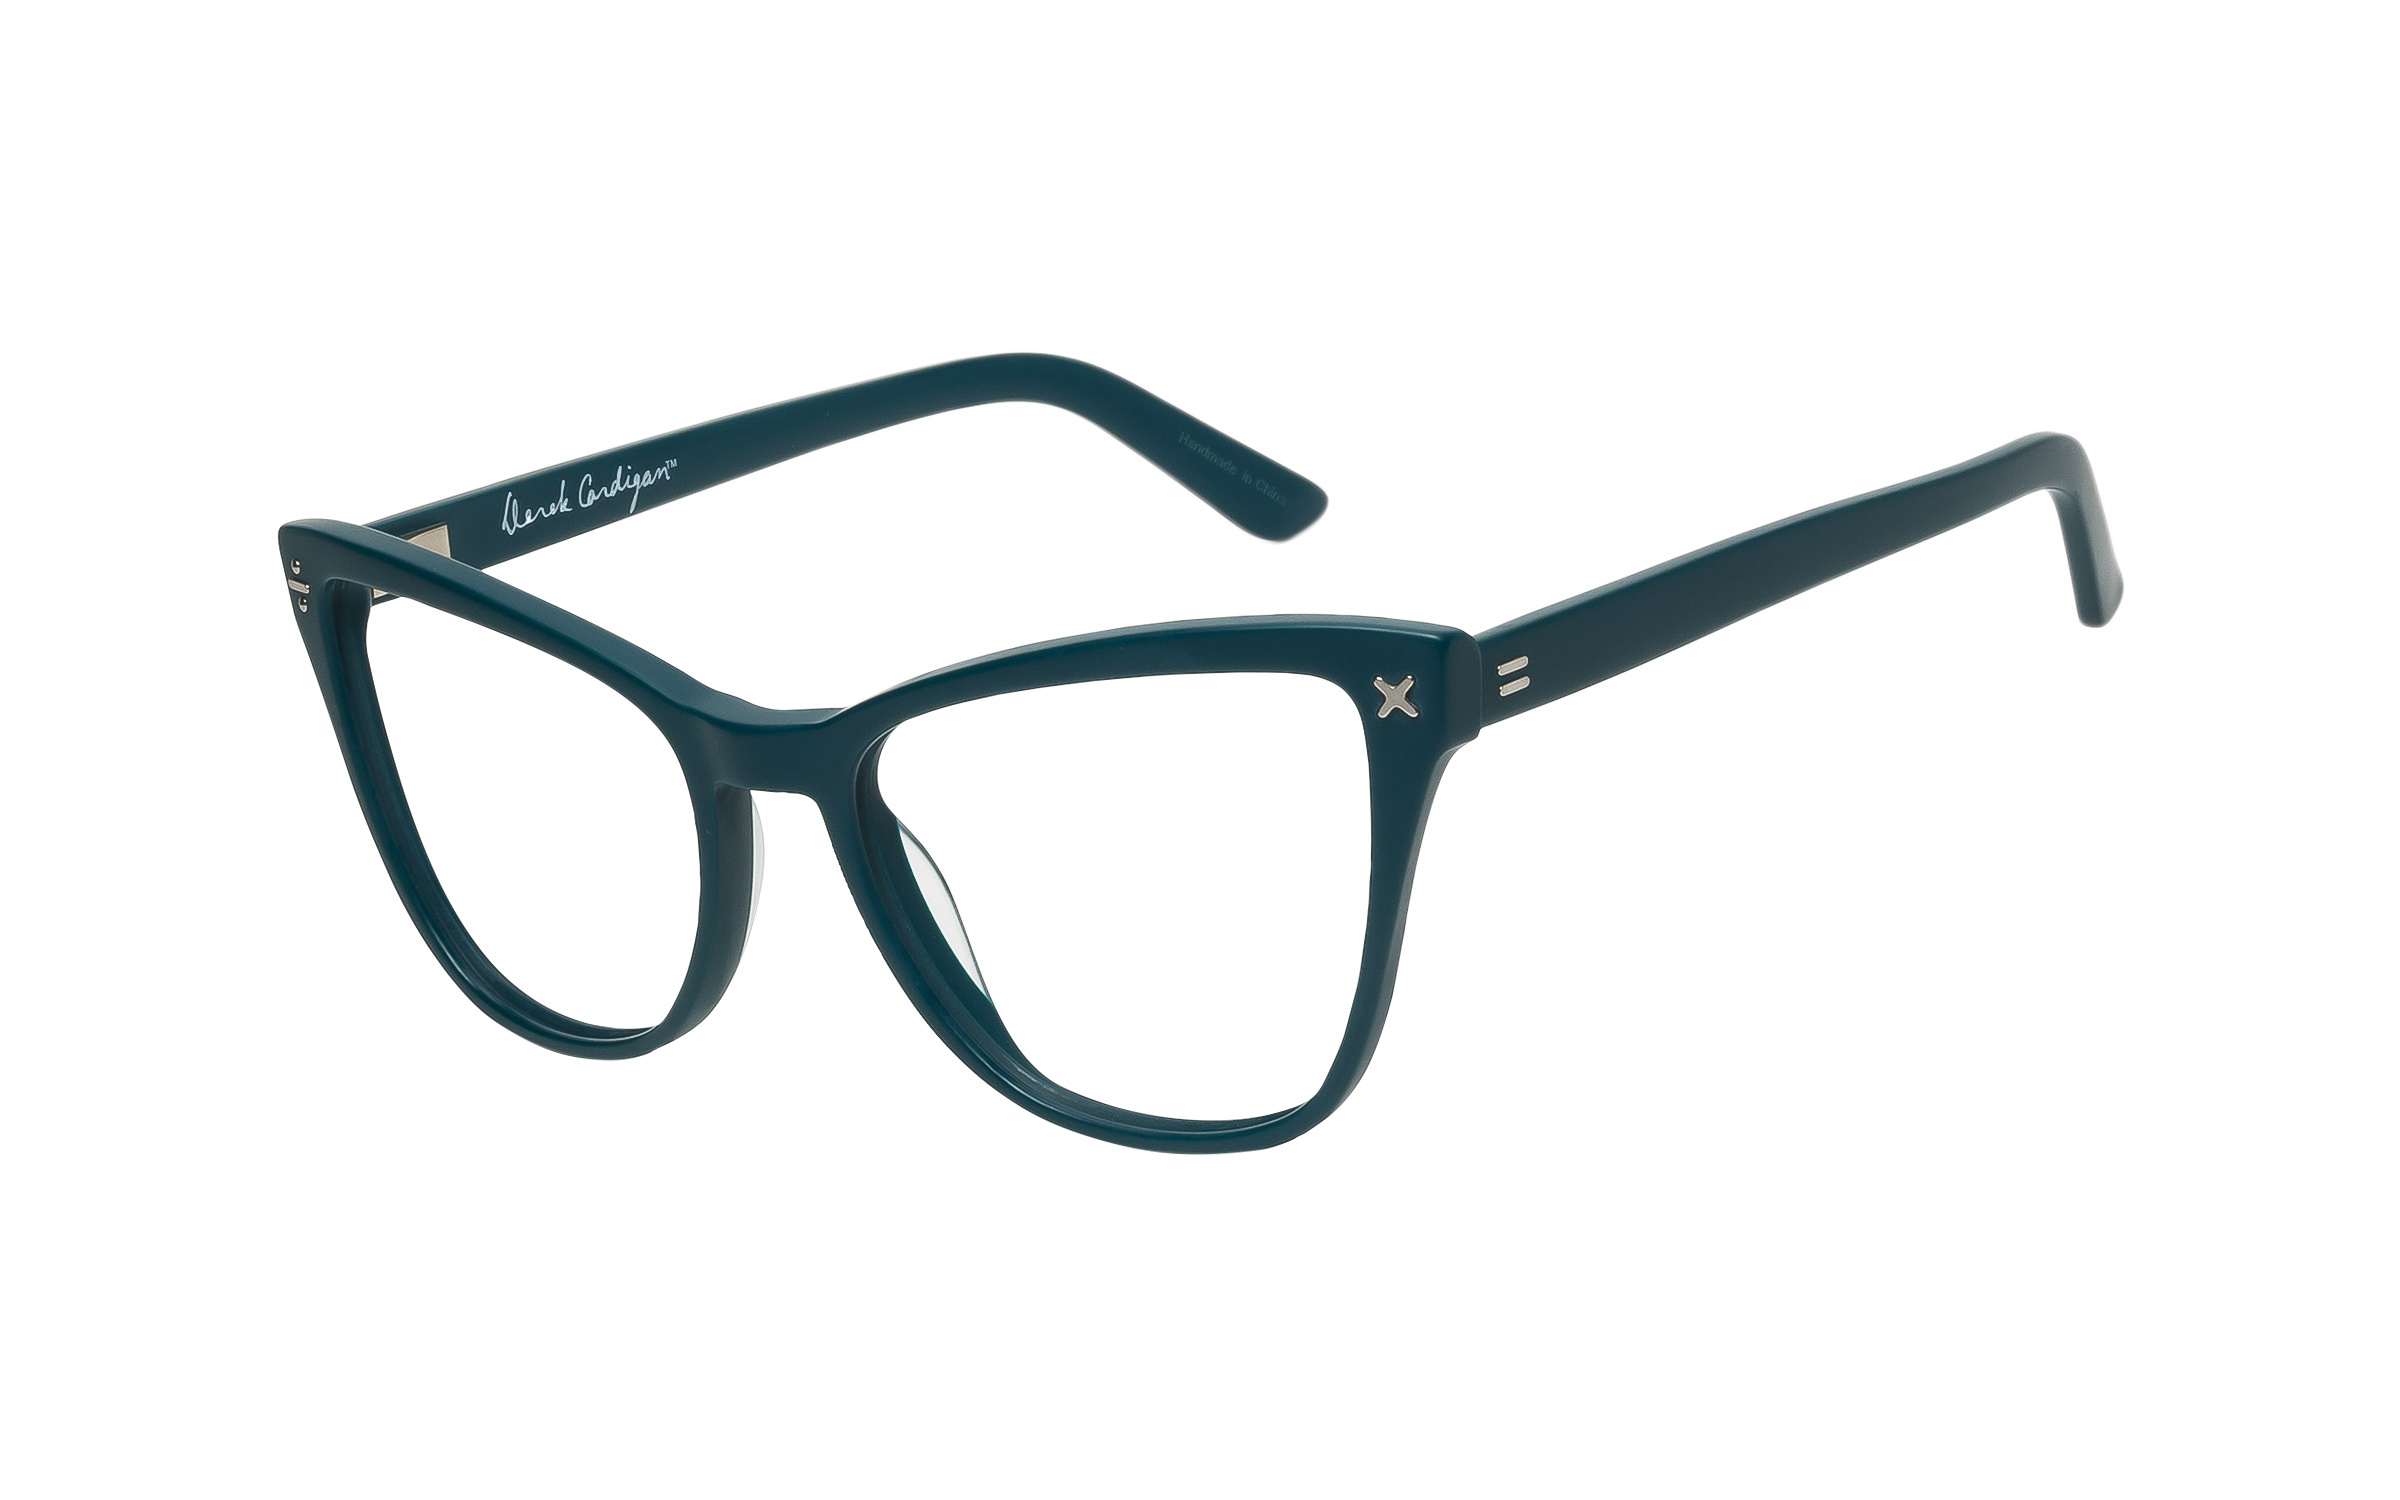 Women's Vintage Glasses Green Derek Cardigan Online Clearly